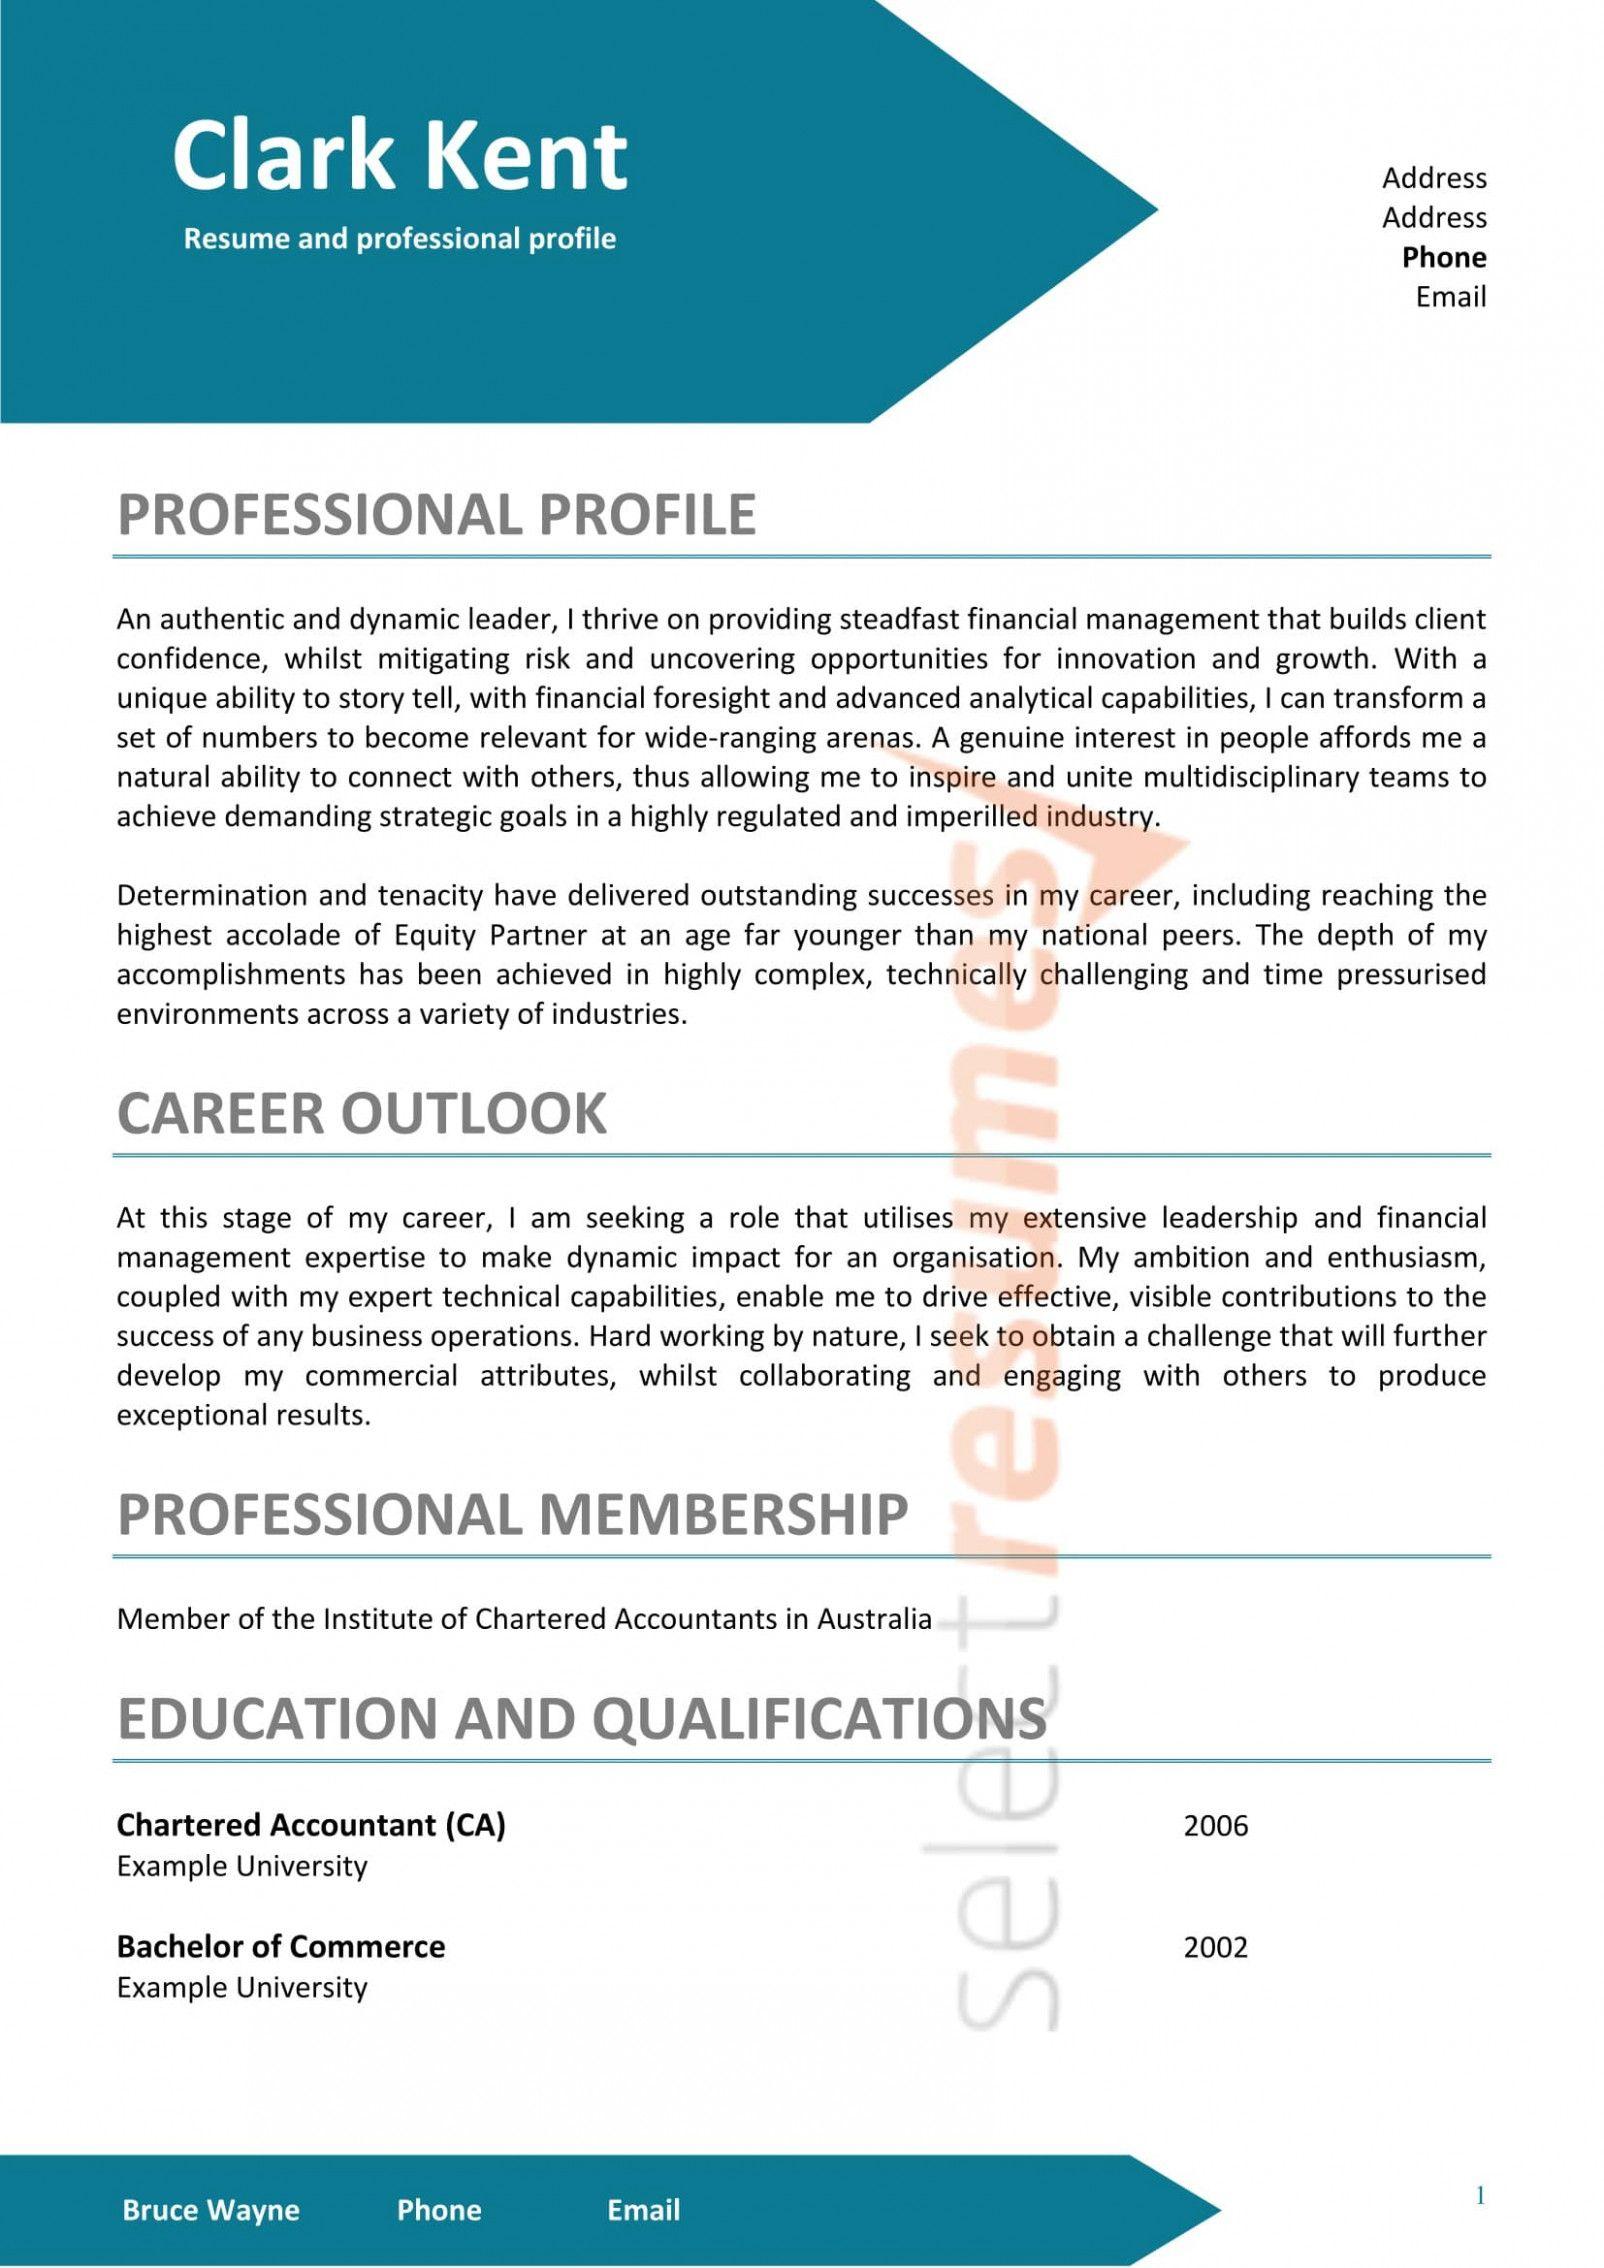 10 Aps Job Software Resume